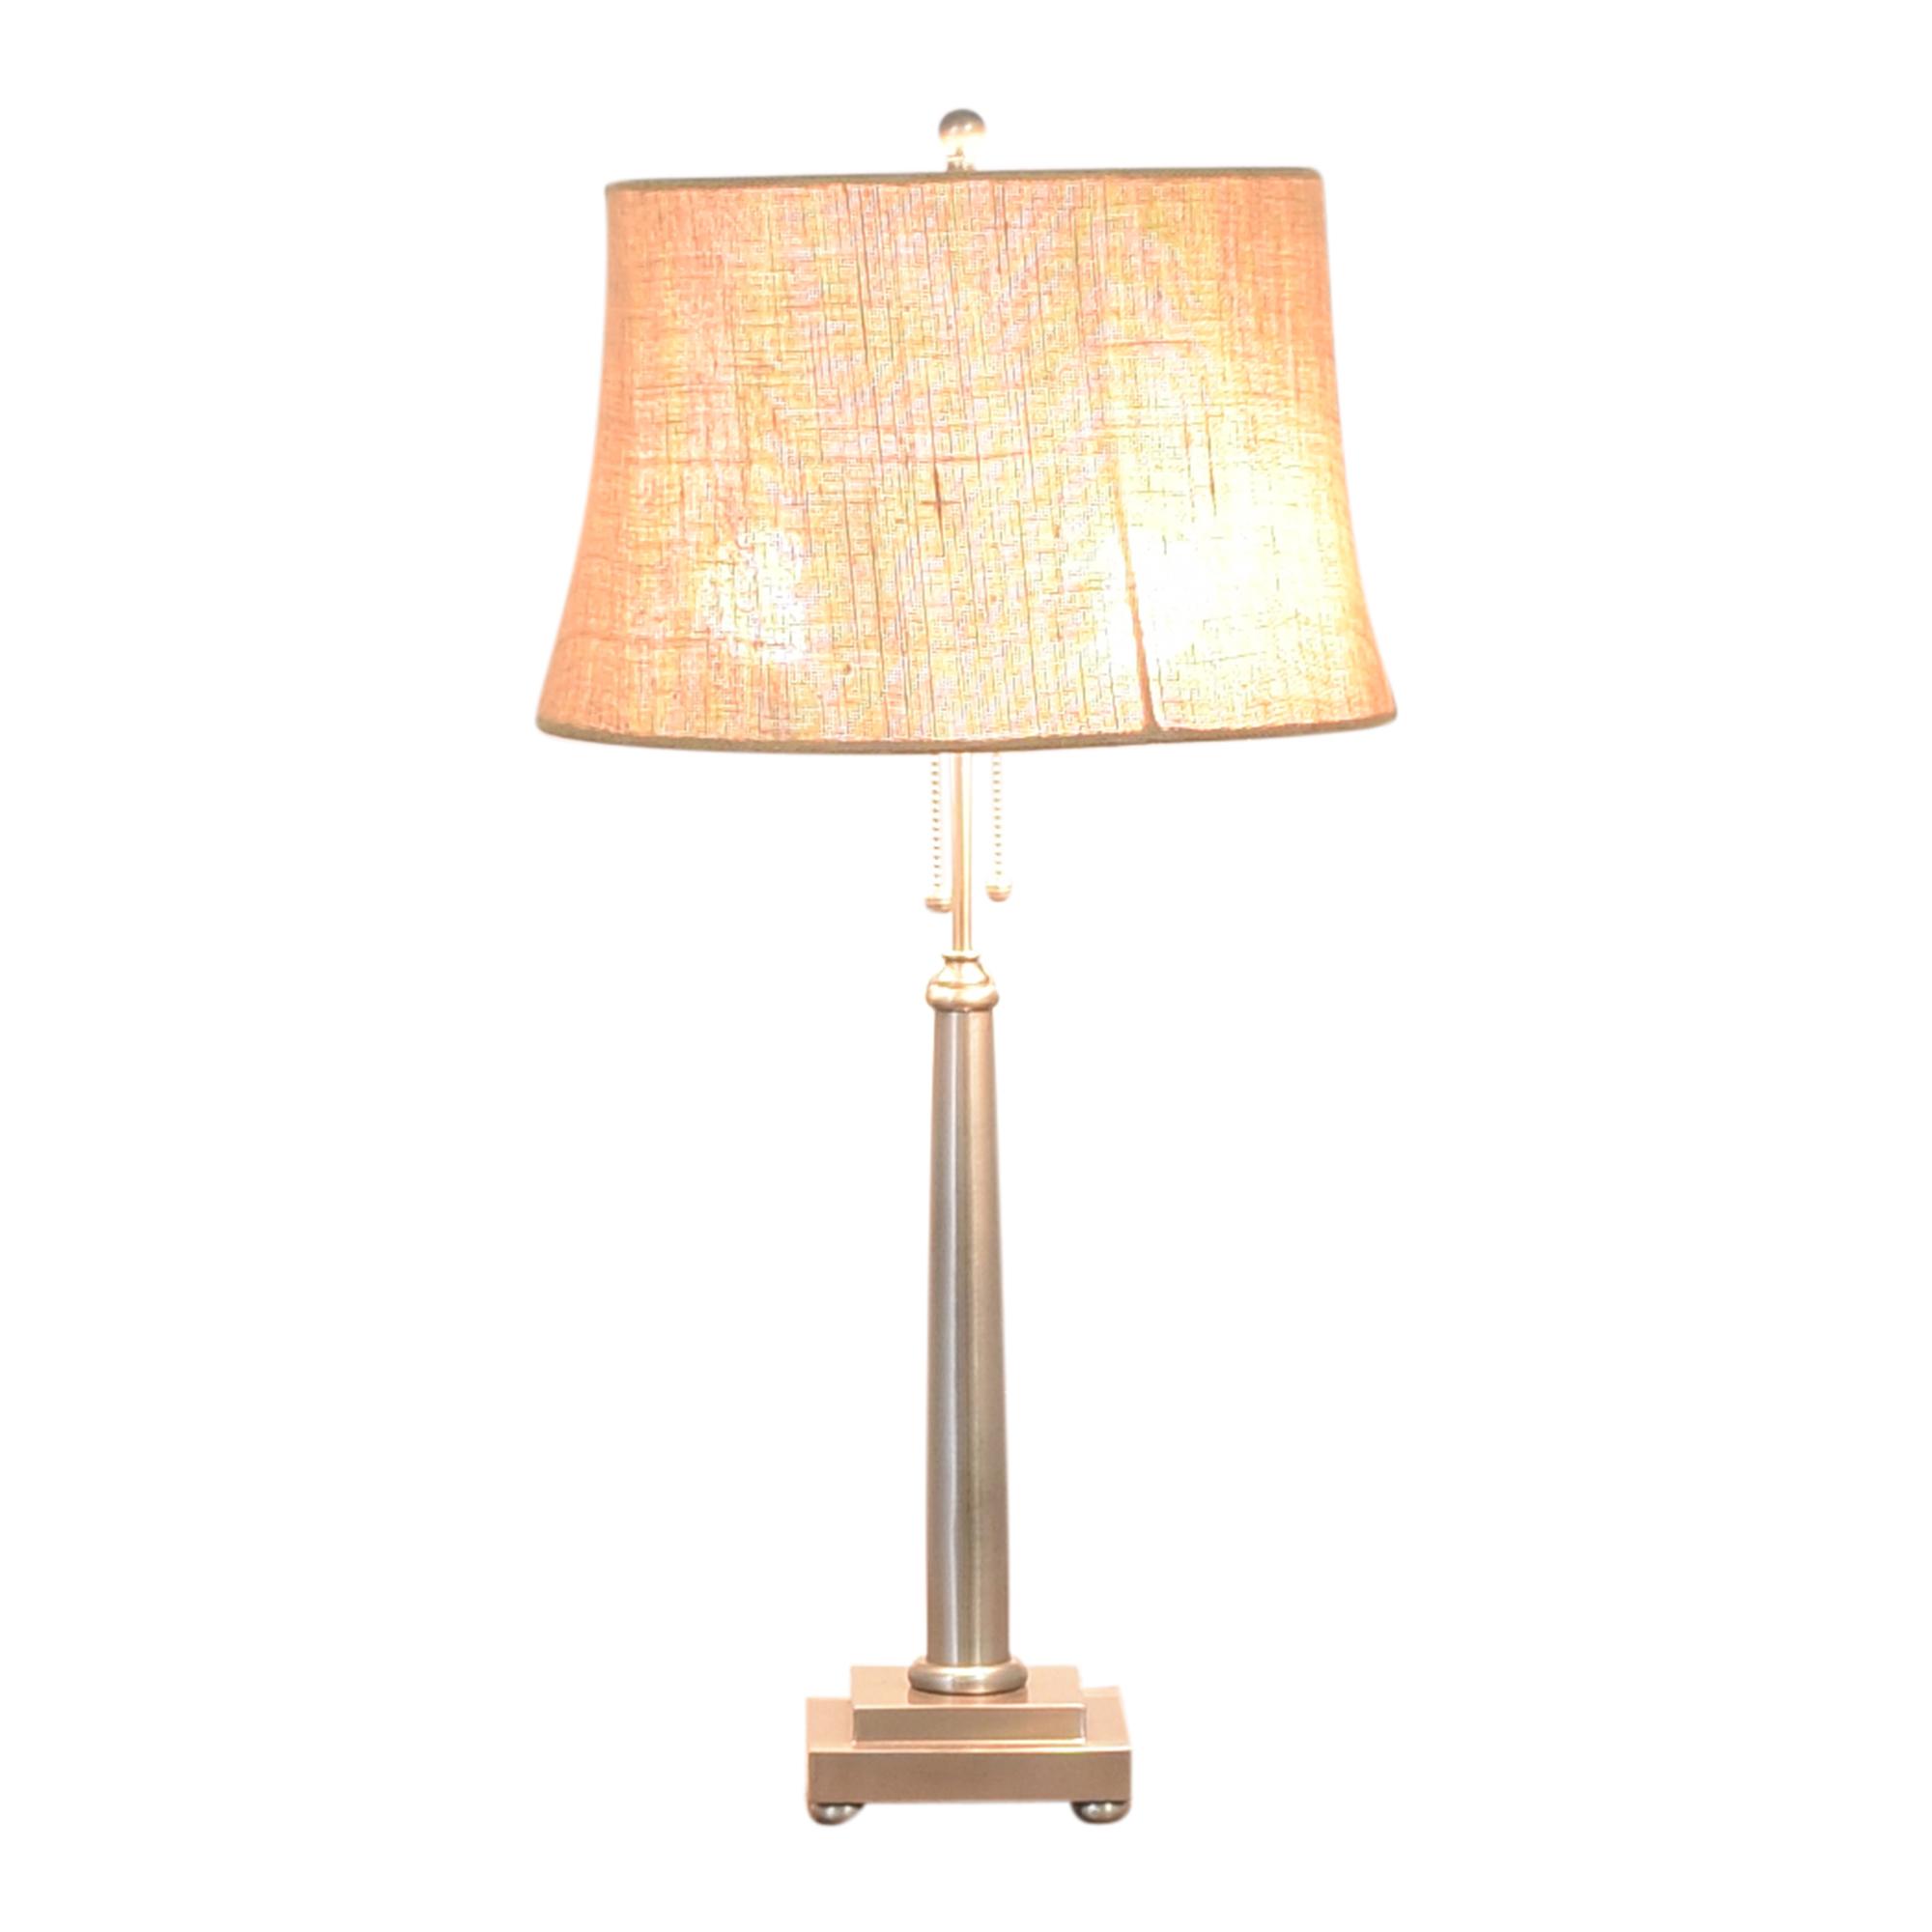 Restoration Hardware Table Lamp Restoration Hardware